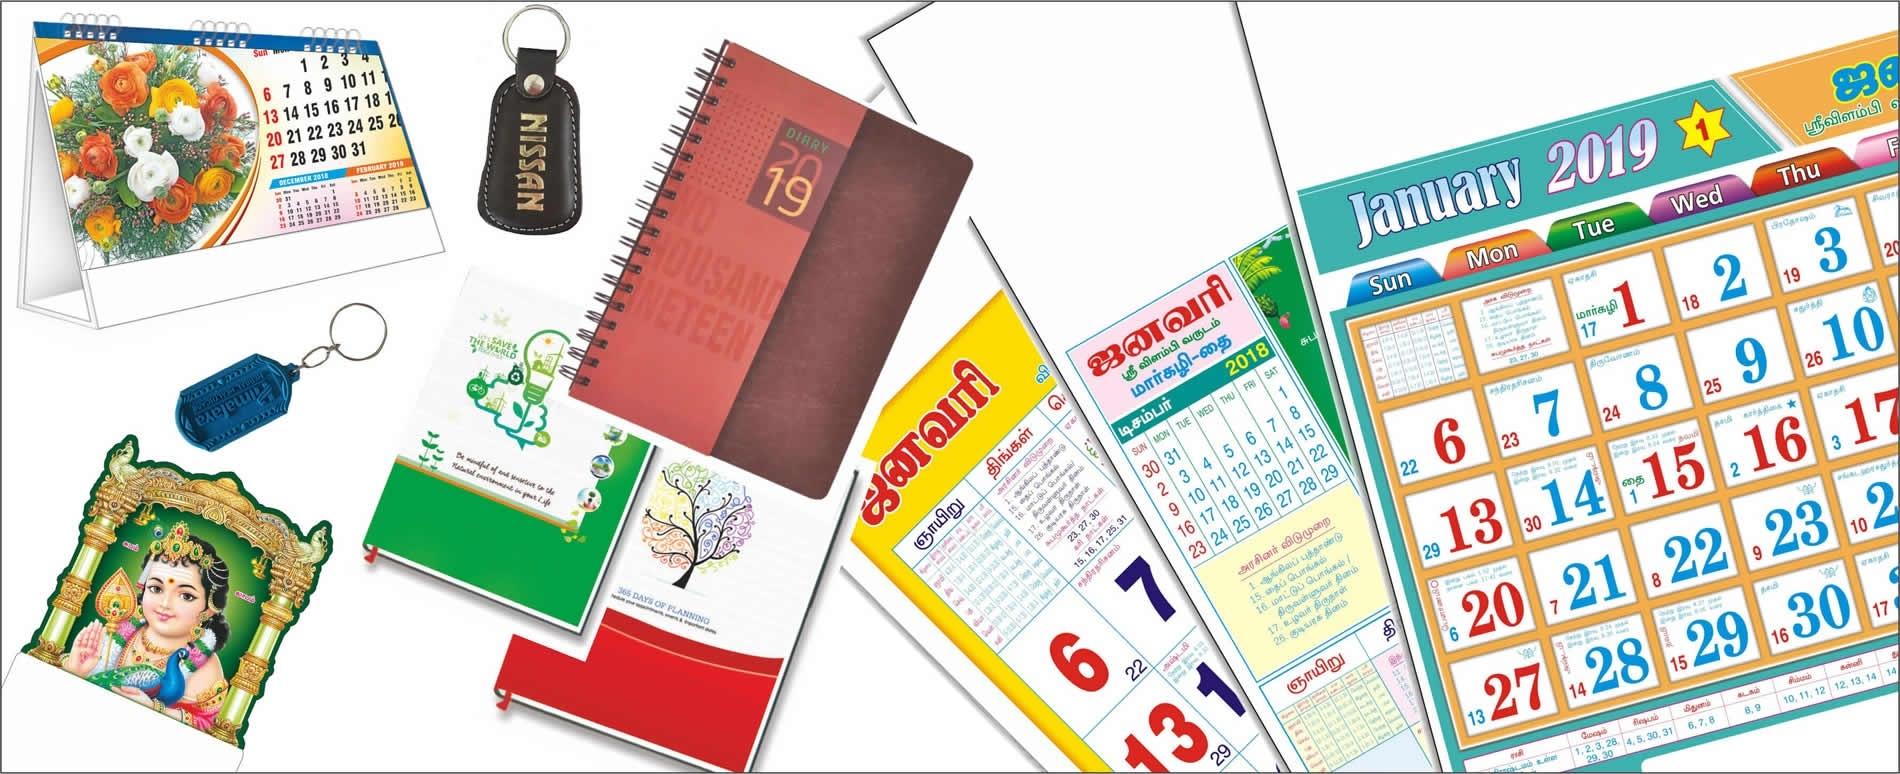 Sibhu Prints - Monthly Calendar, Offset Printing, Keychain_Calendar 2019 Printing Chennai